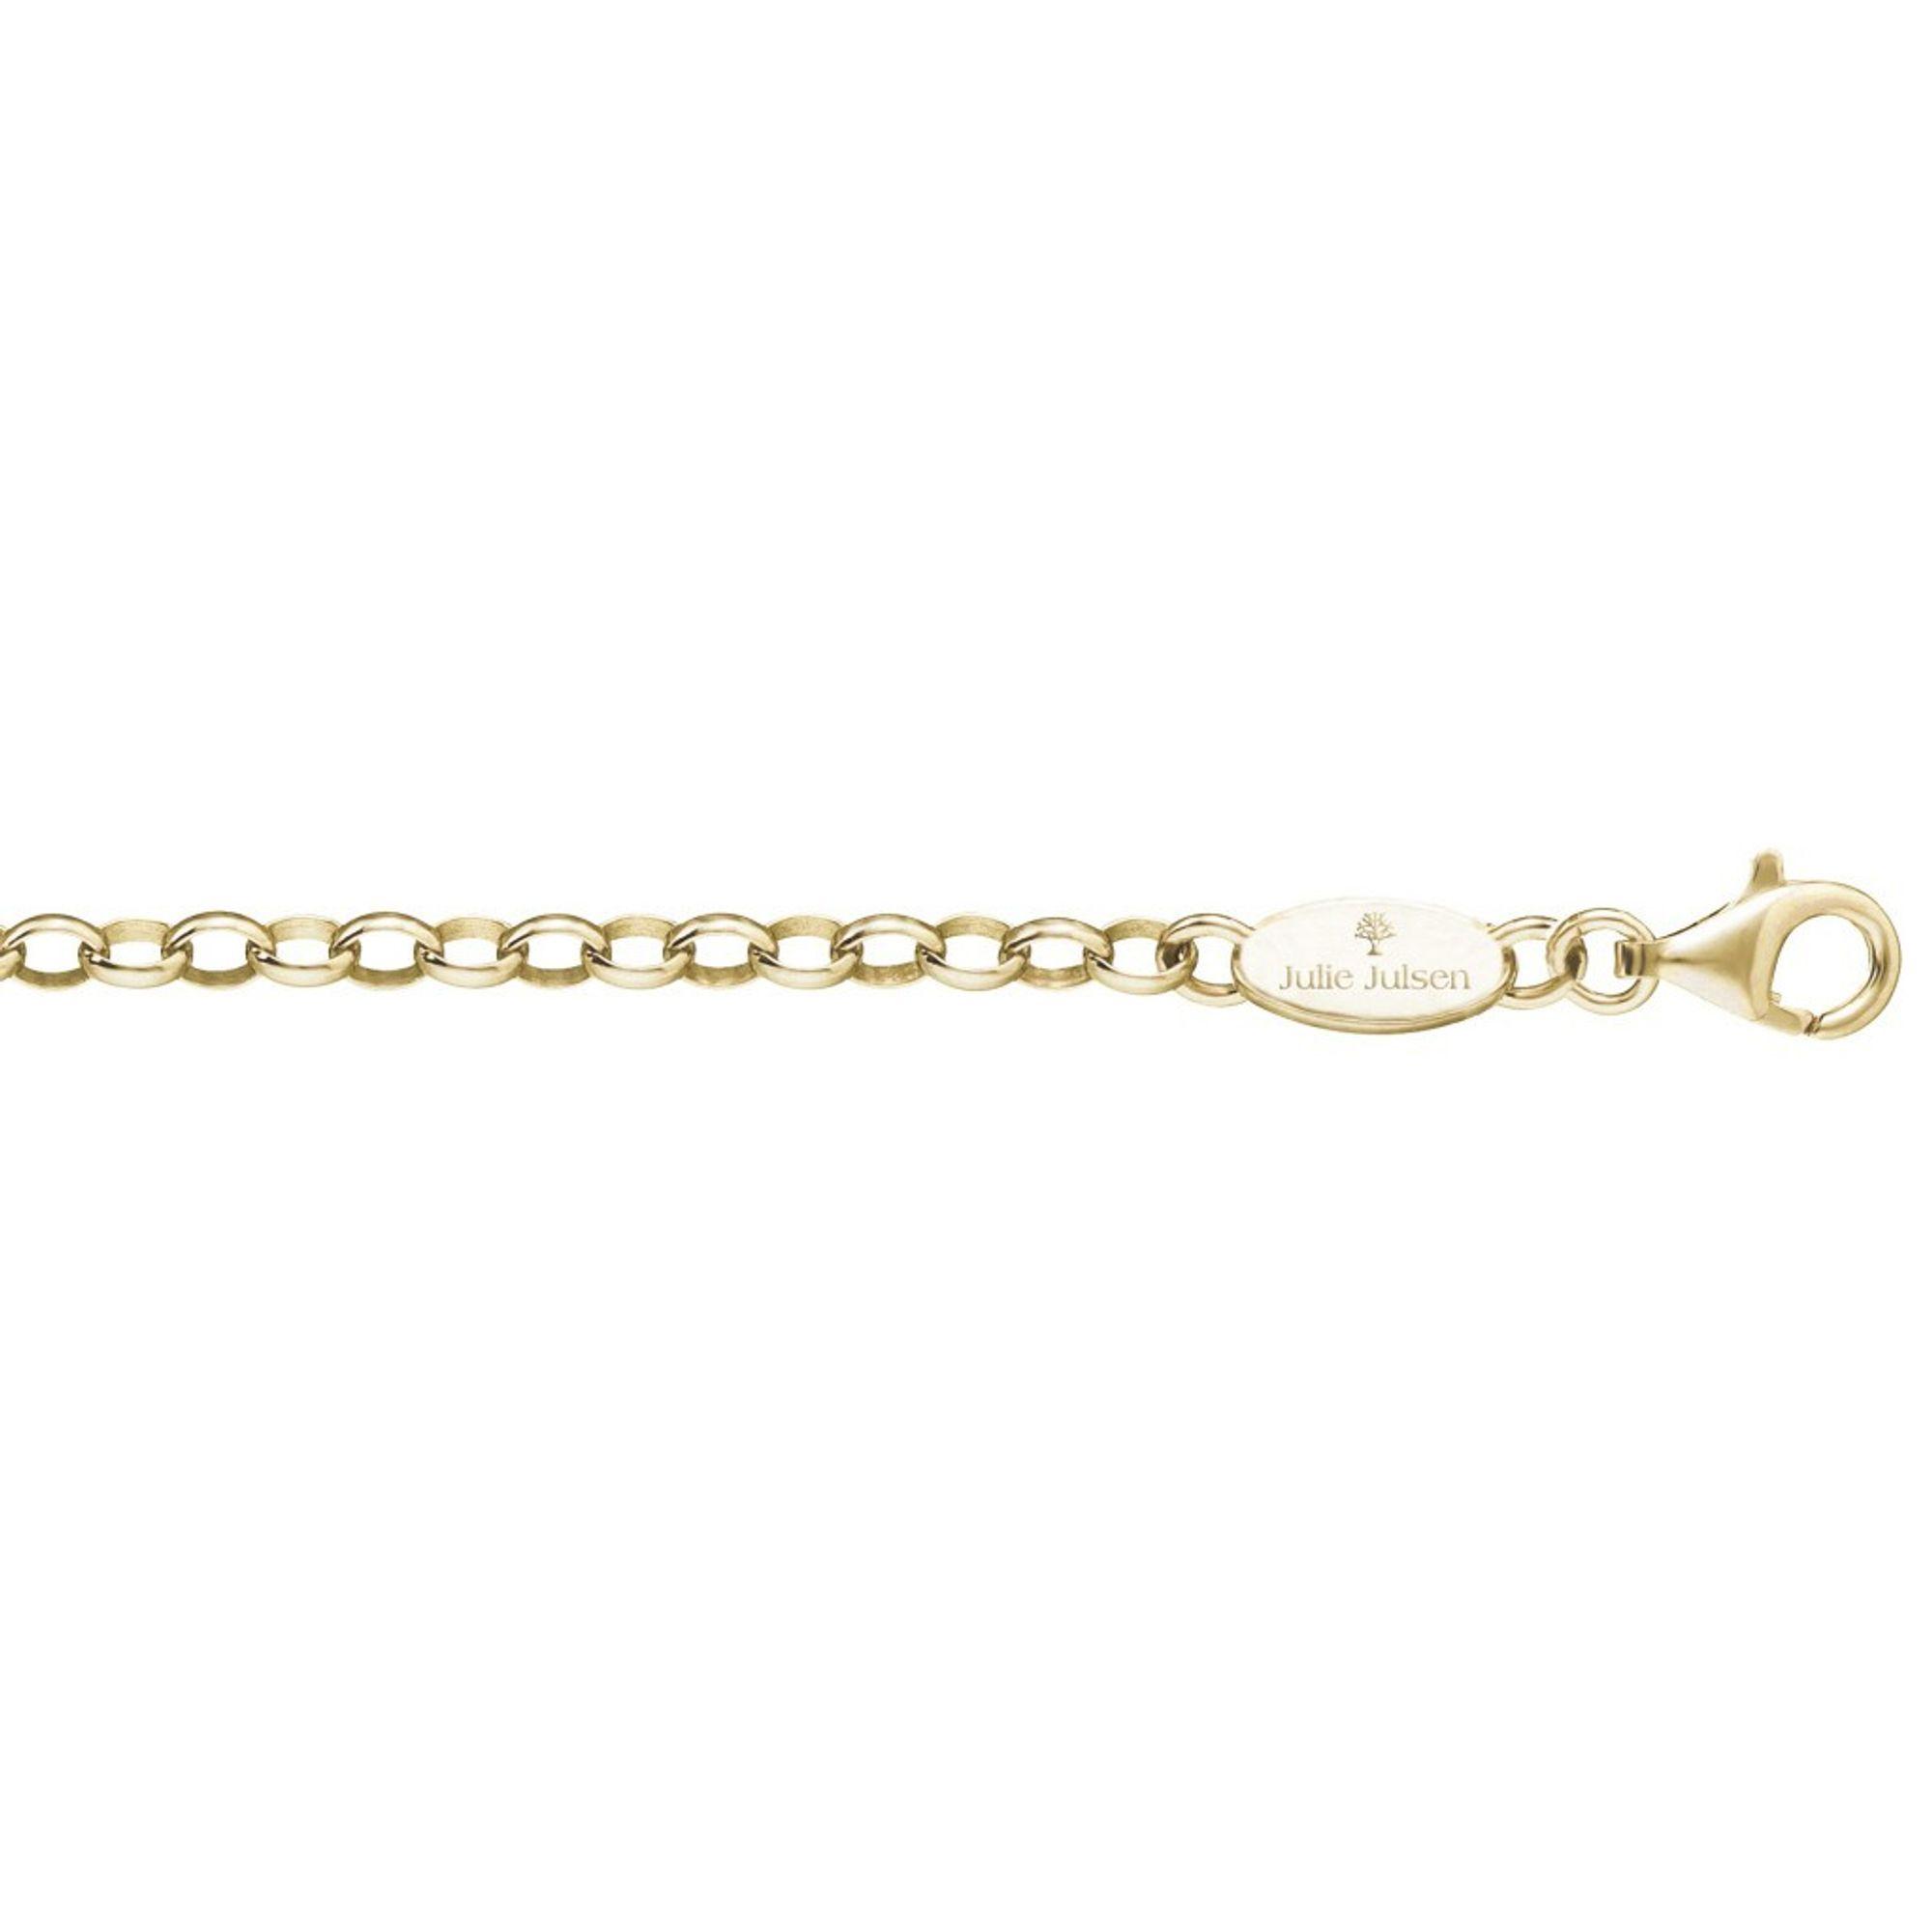 Julie Julsen® JJC042YG Damen Kette Silber gold 42 cm